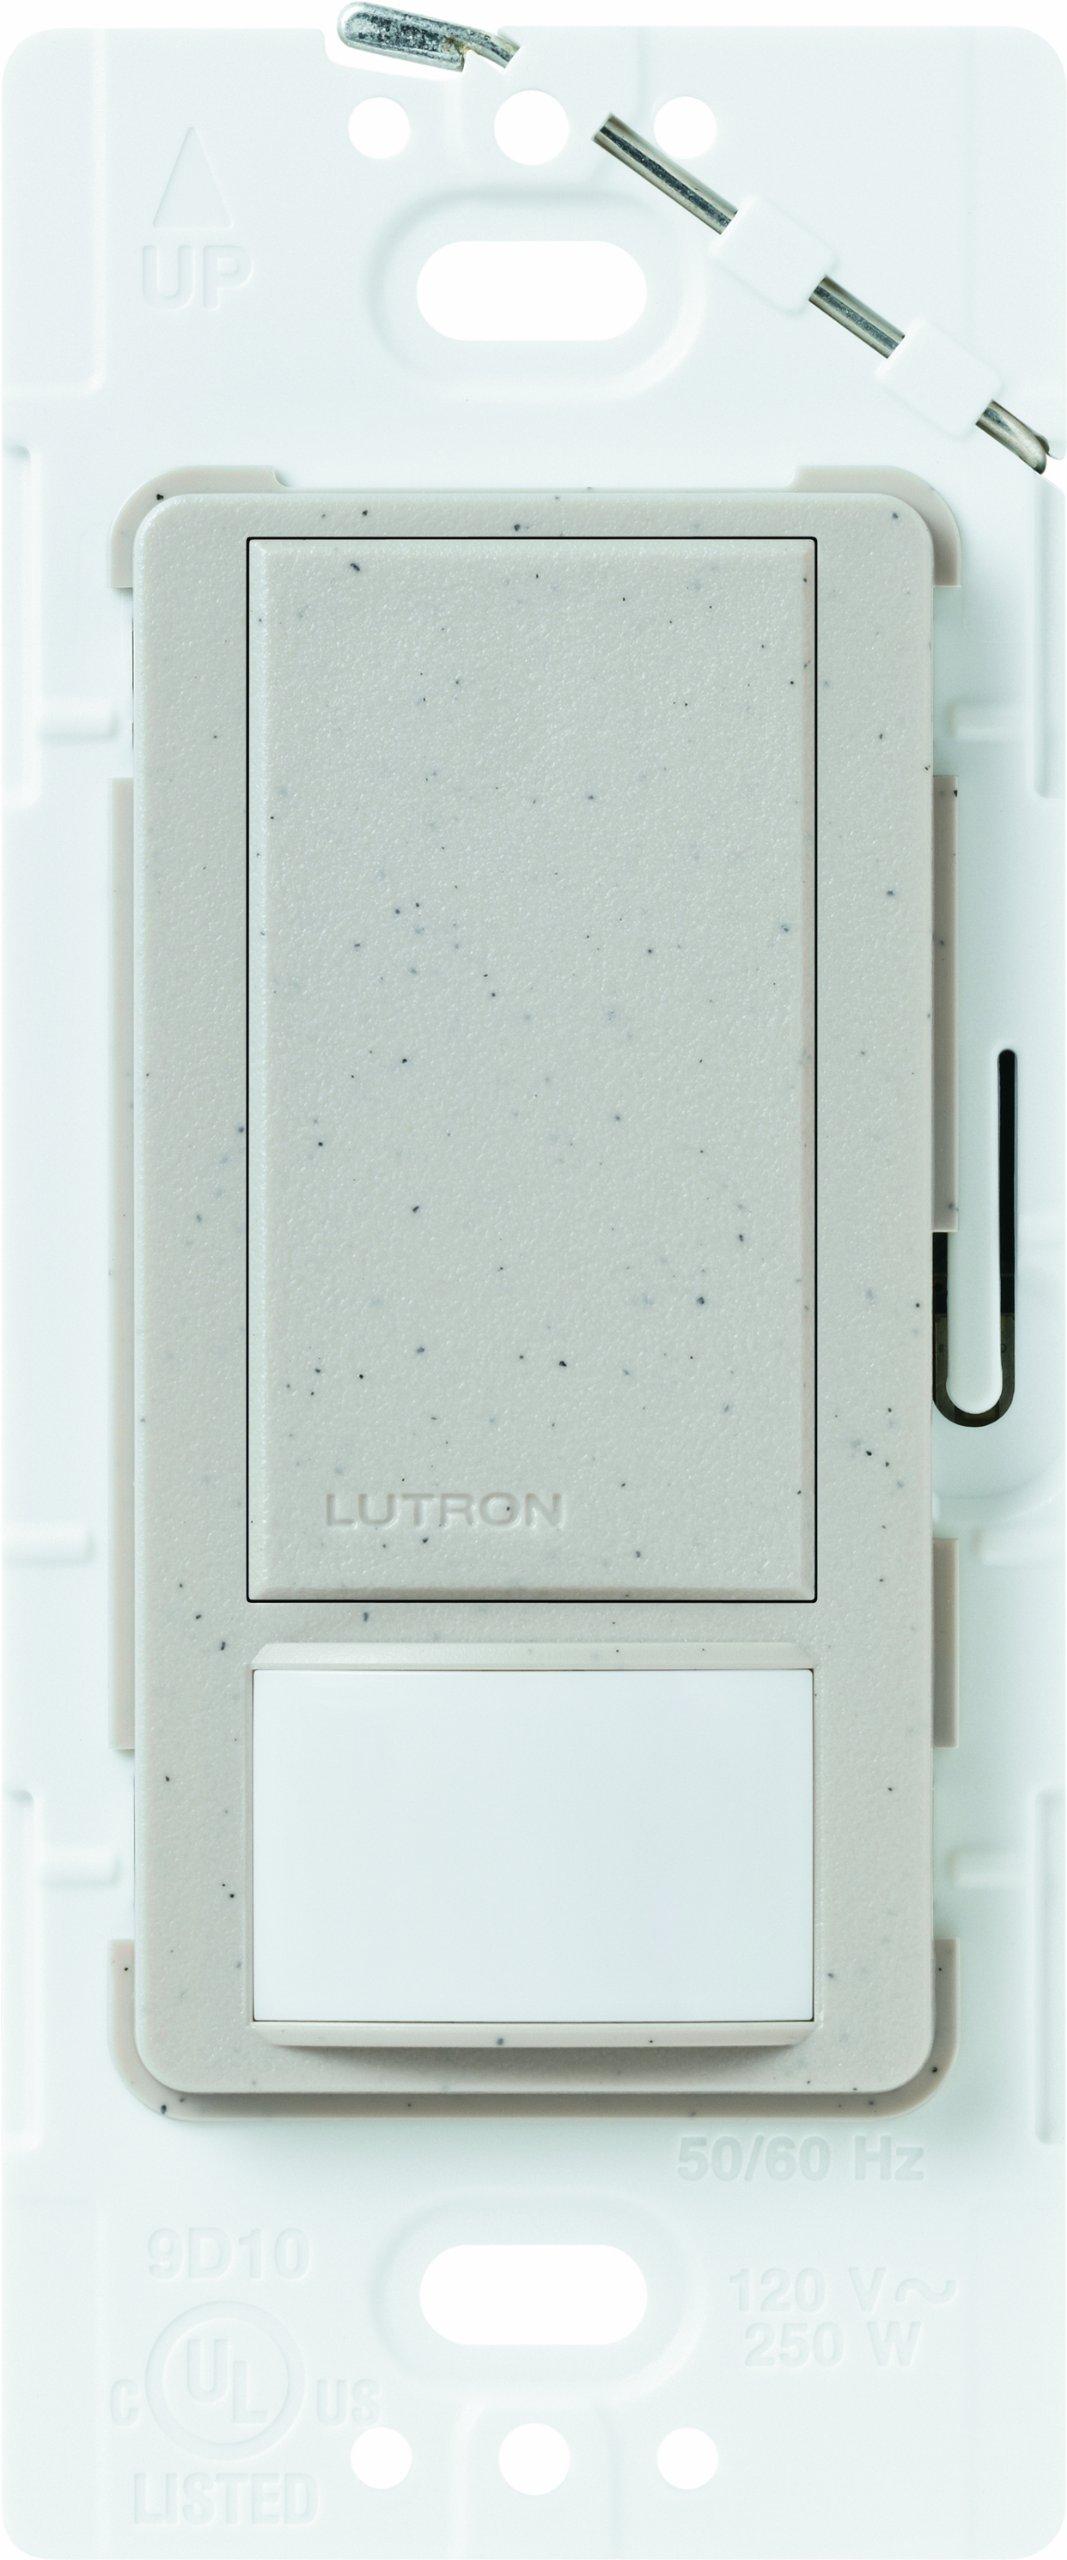 Lutron MS-VPS2-ST VACANCY SENSOR SWITCH, Stone